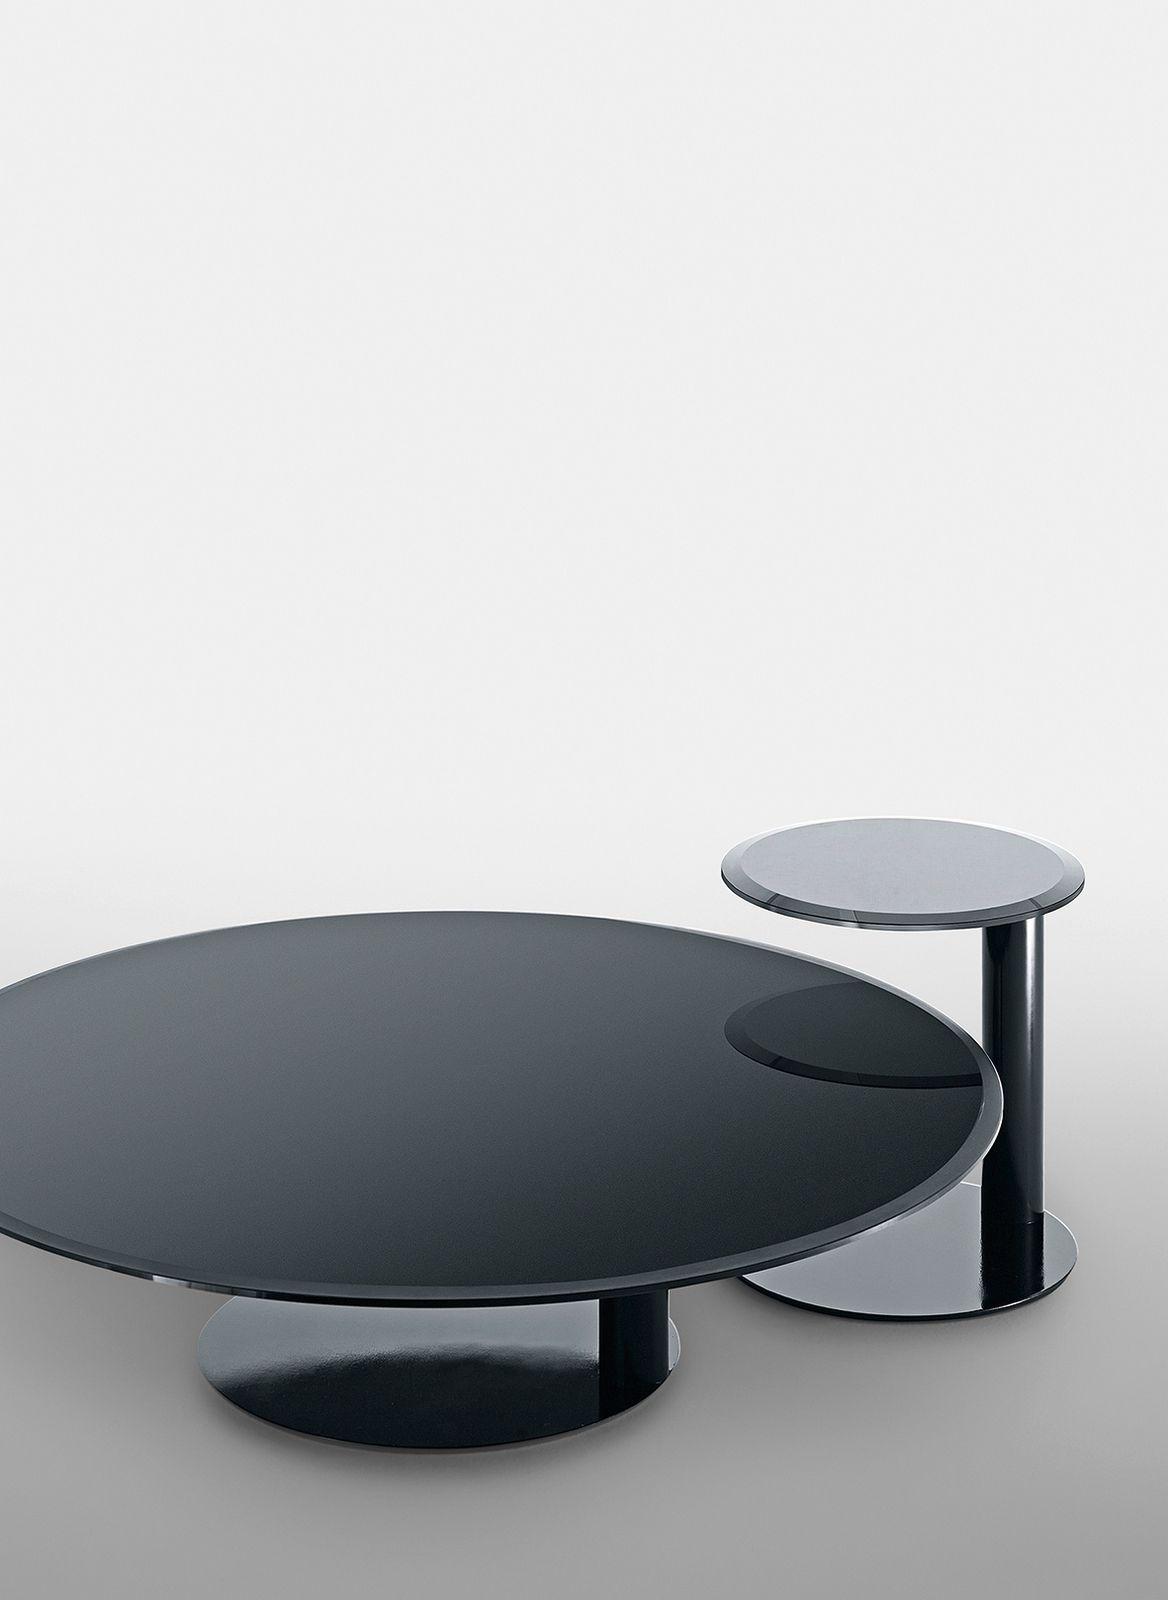 lacquered round coffee table oto mini oto collection by gallotti radice design gabriele. Black Bedroom Furniture Sets. Home Design Ideas